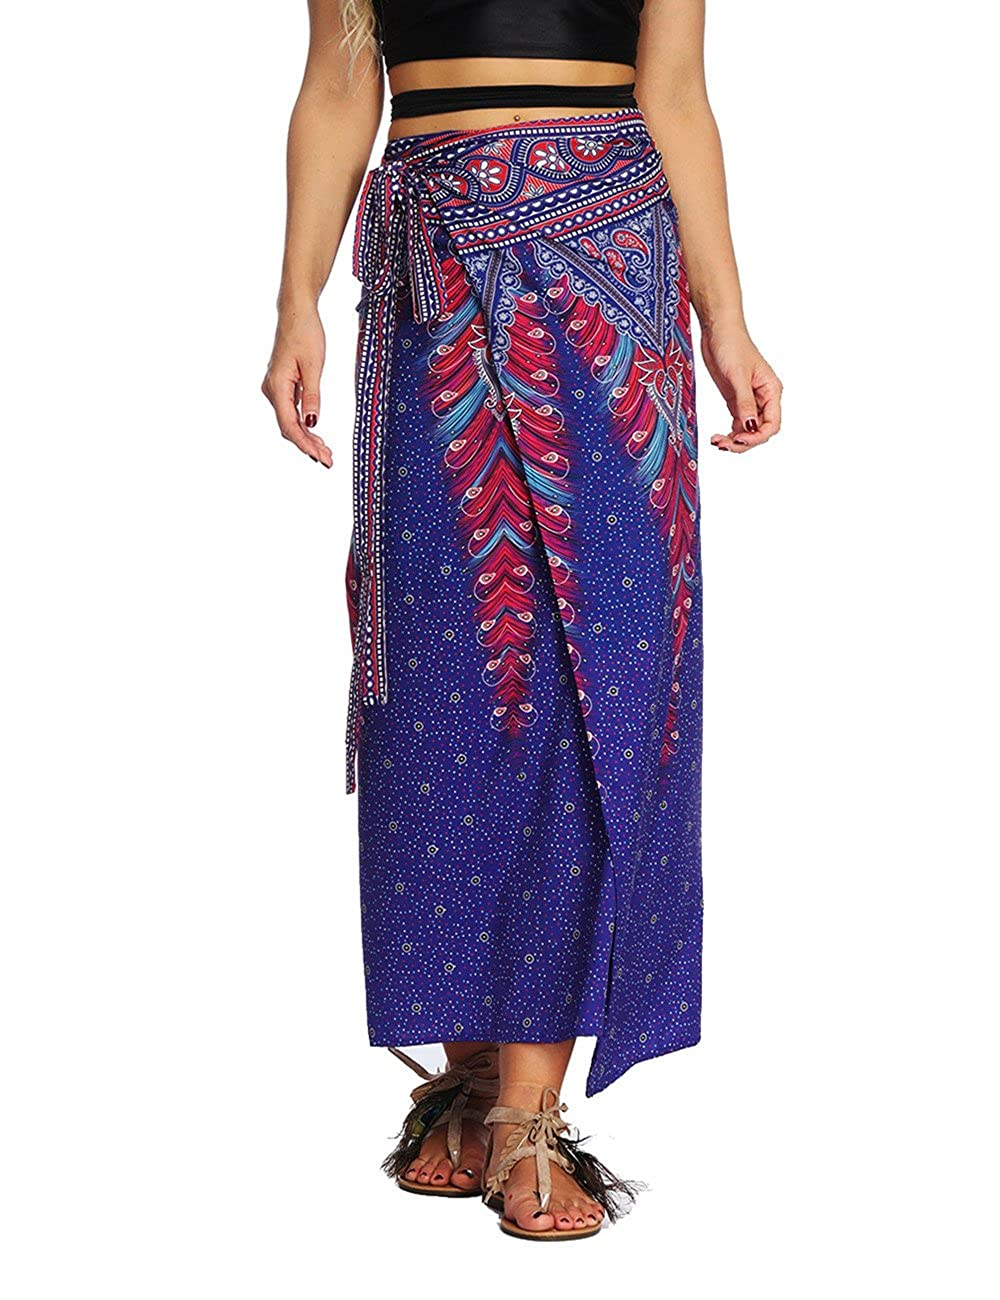 Women Summer Wrap Maxi Skirt Seamless Tie up High Waist One Piece Skirt Indie Folk Hippie Boho Aladdin Wrap-Around Skirt BlackElephant) UKWSOnePSkirtBlackElephant1